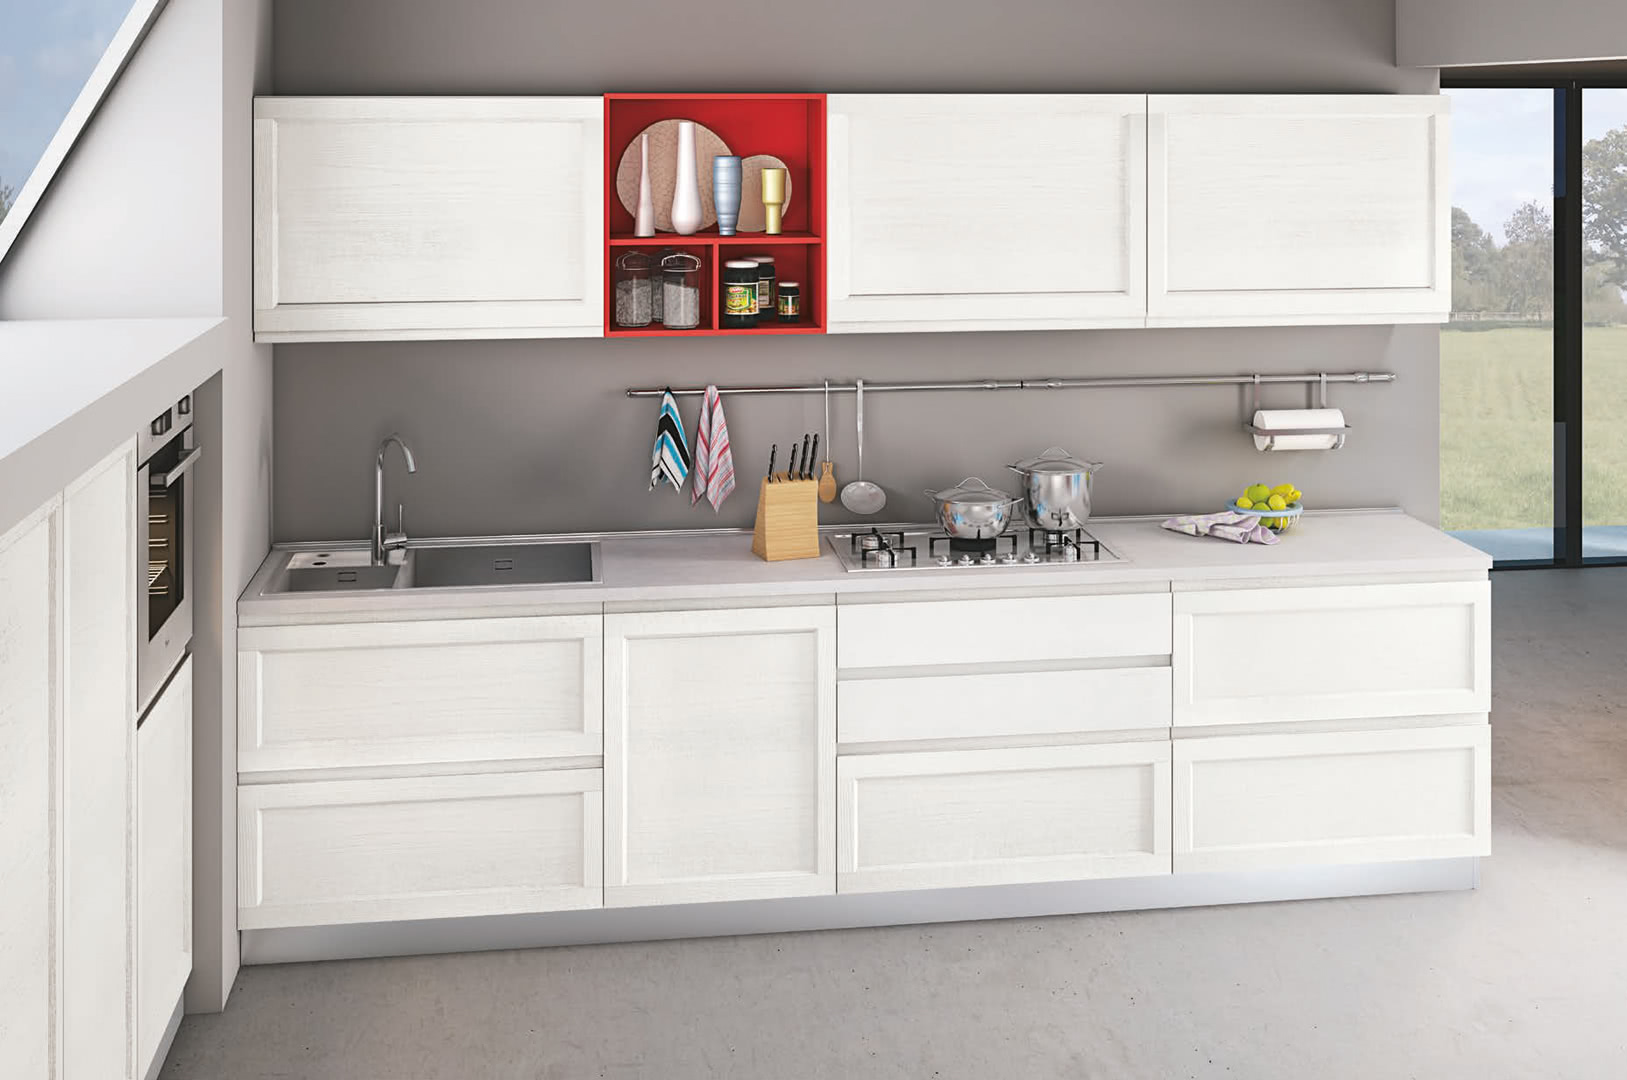 1121_selma-cucina-ambientata-3